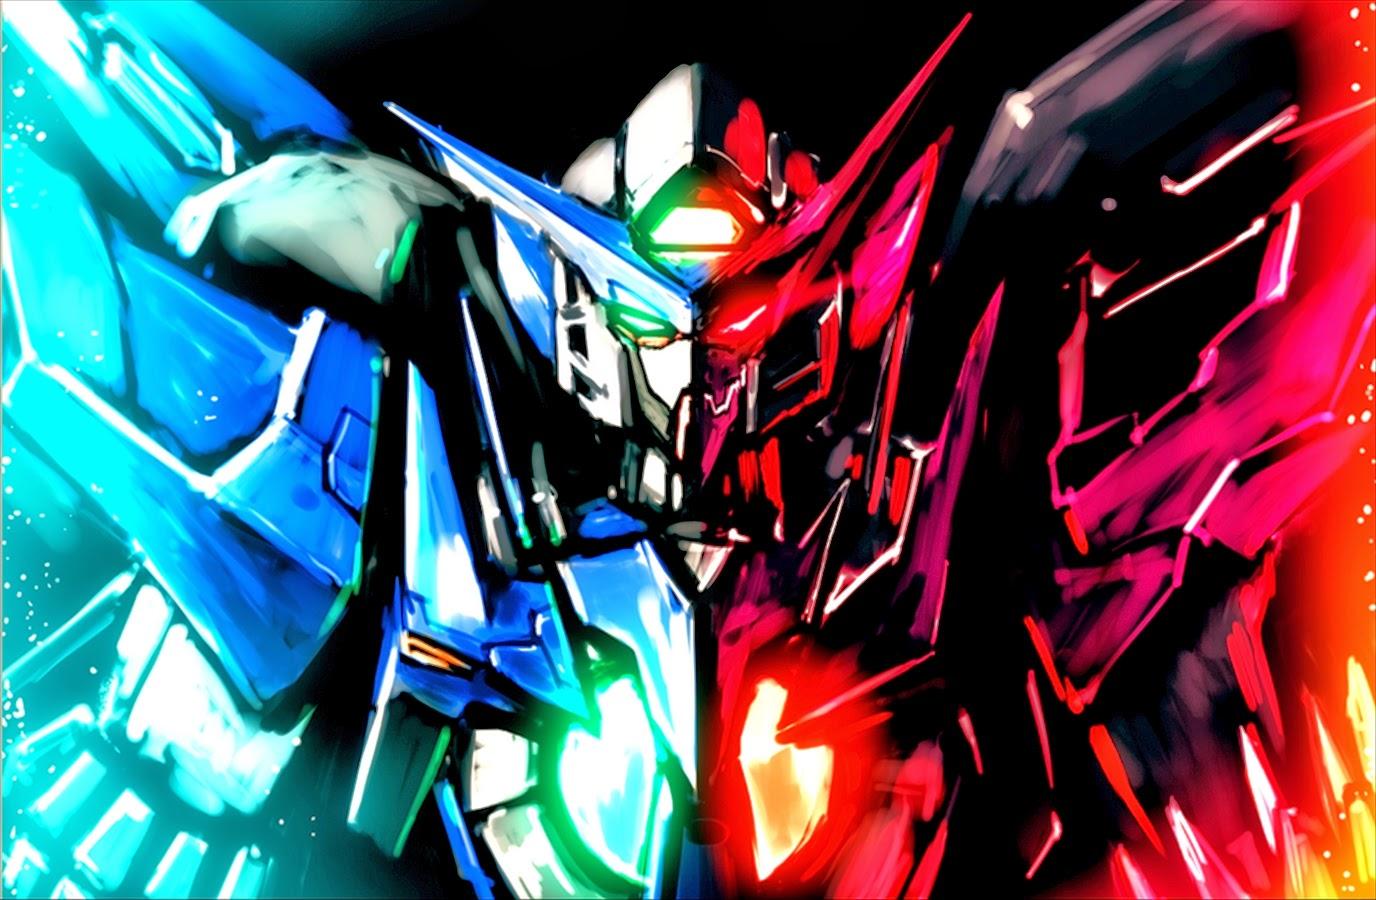 Gundam Exia Dark Matter Wallpaper Poster Image   Fanmade 1376x900